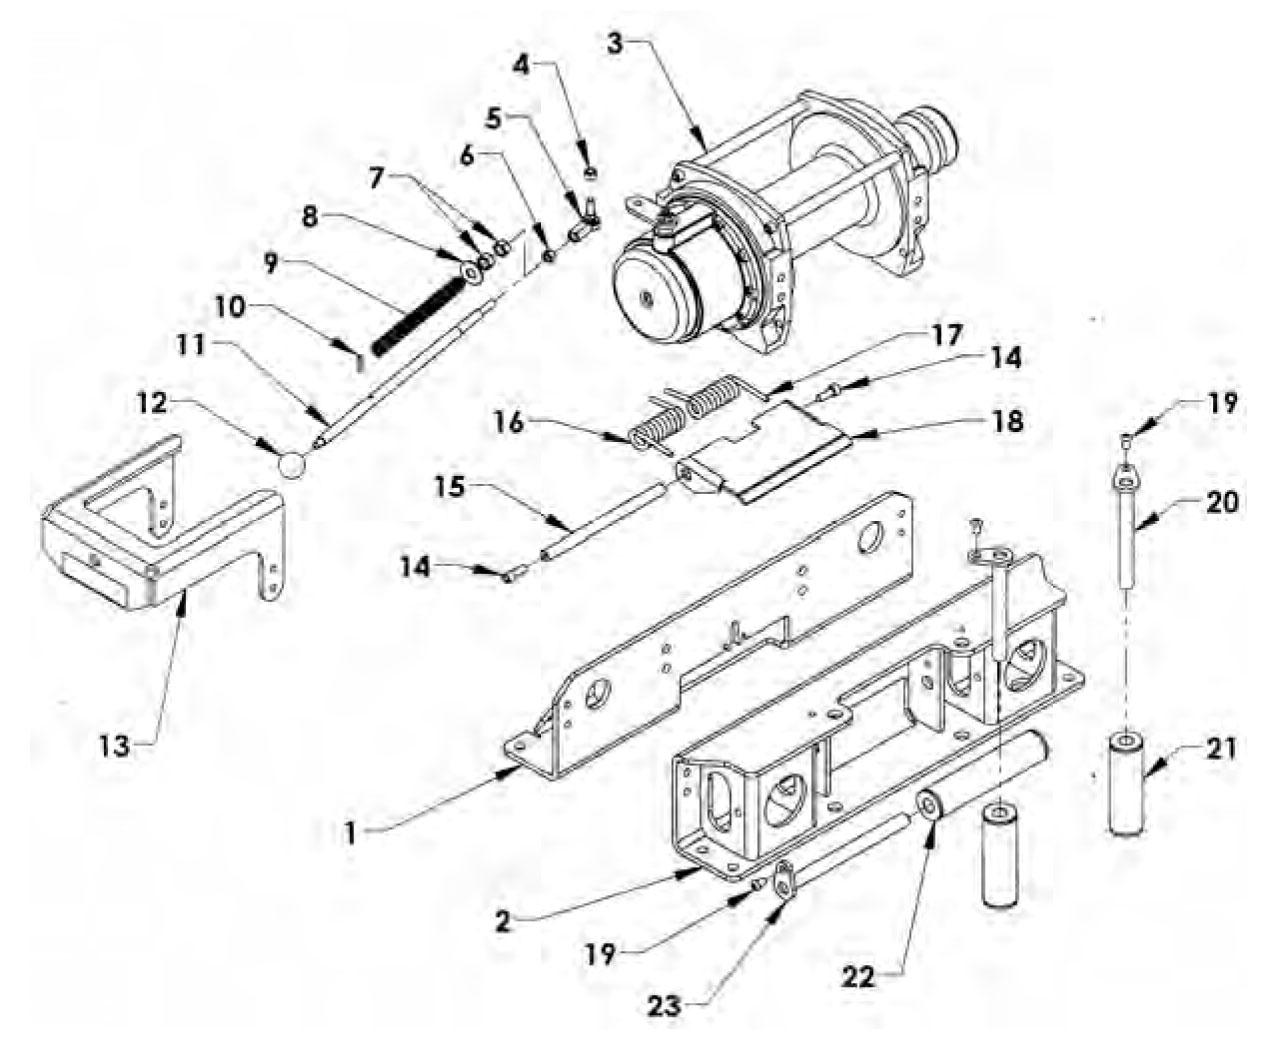 ramsey winch repair manual free wiring diagram for you Electric Winch Wiring Diagram ramsey winch parts breakdown wiring diagram fuse box ramsey winch repair manual ramsey winch wiring diagram